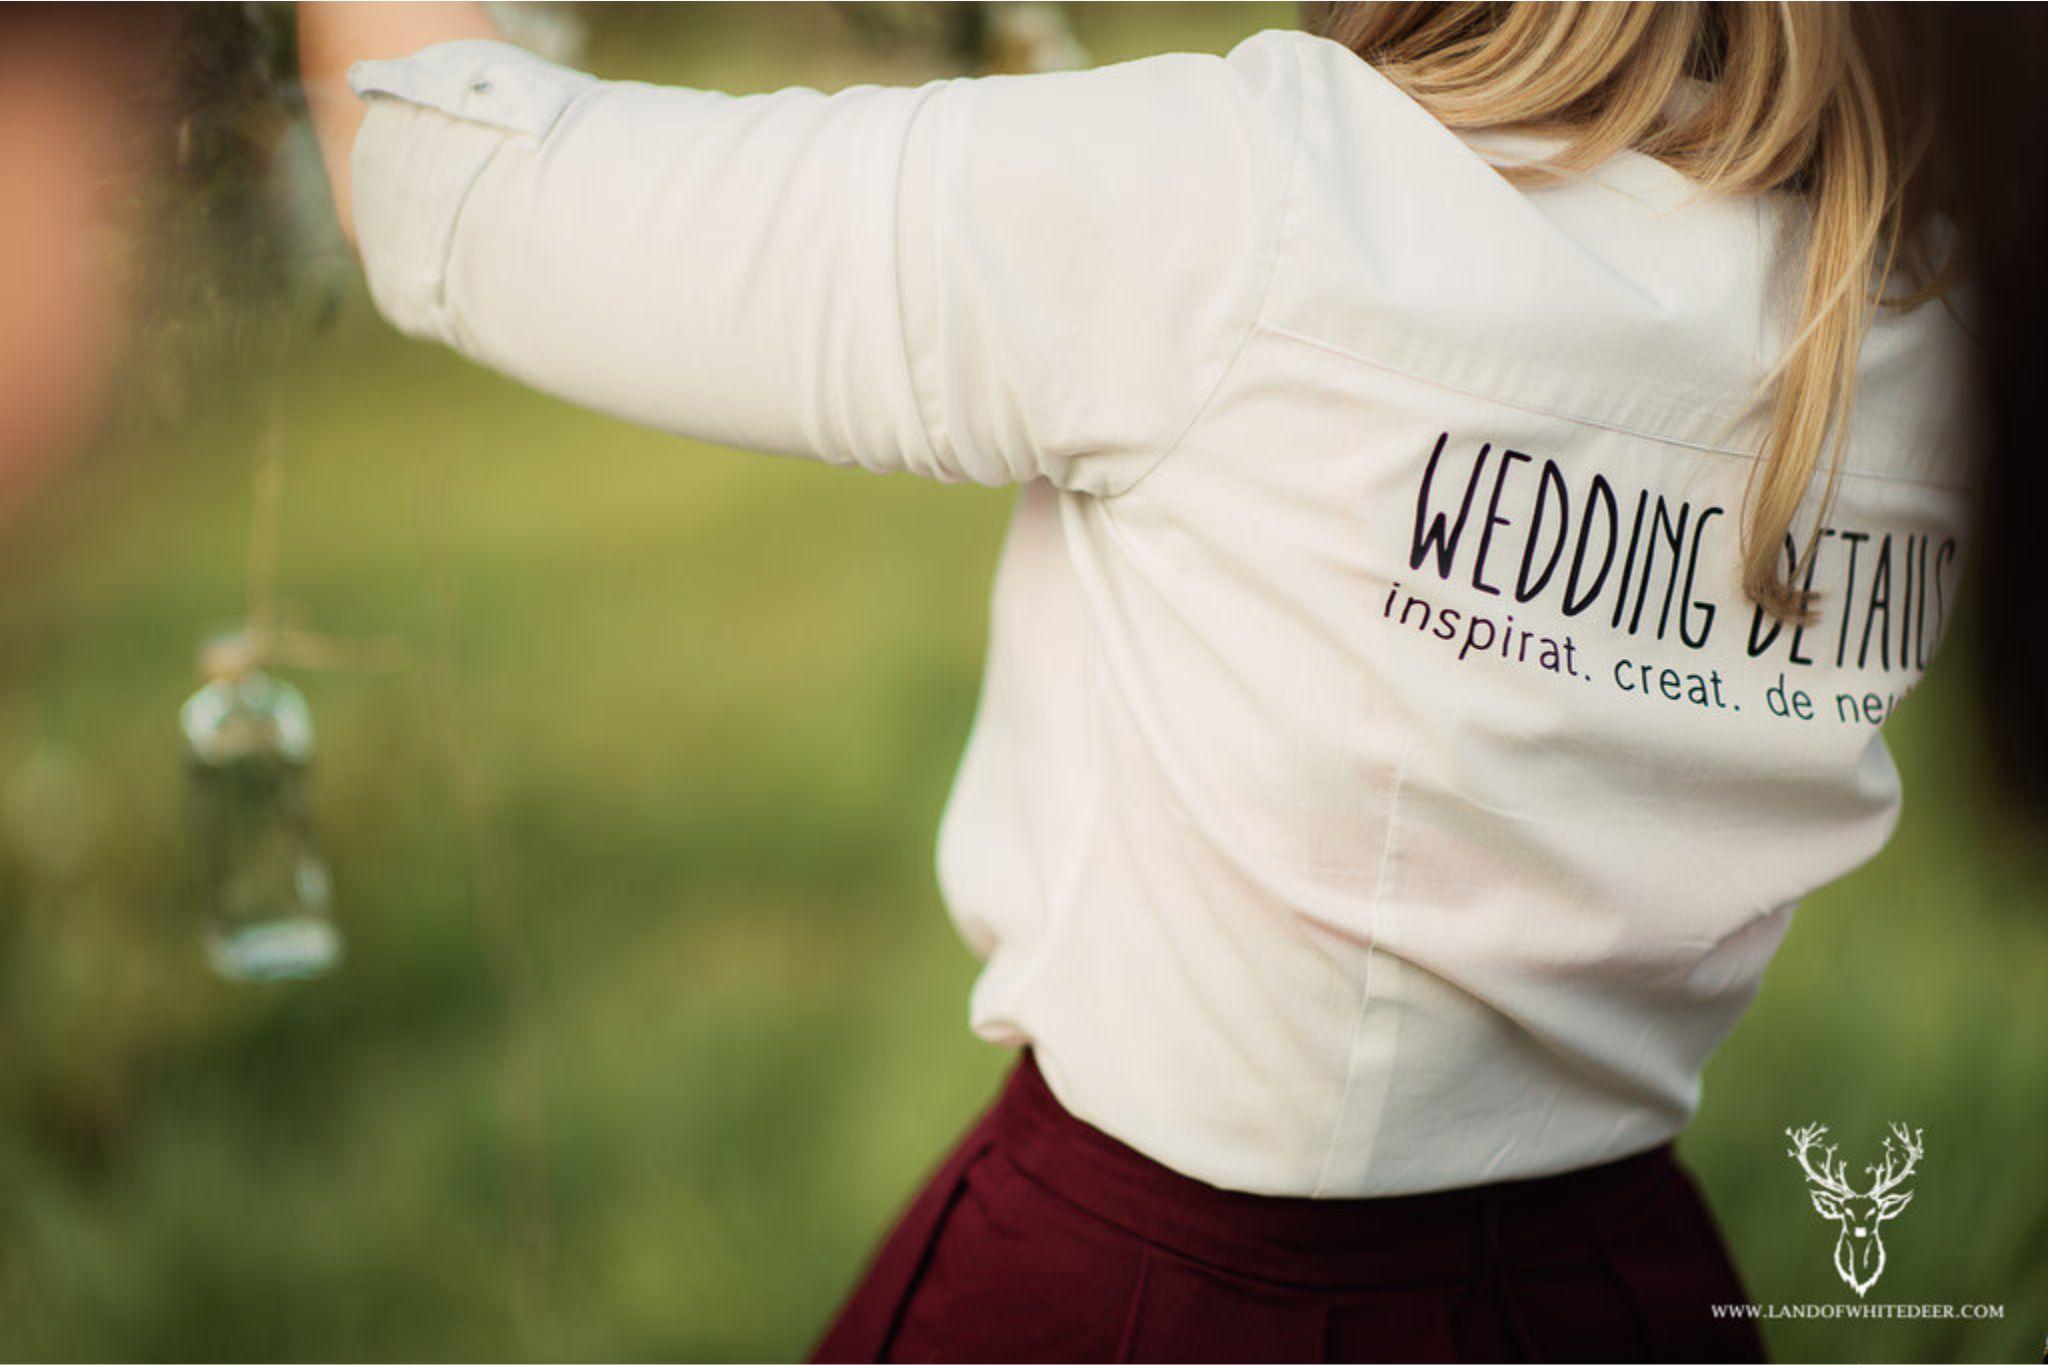 nunta ca proiect de arhitectura wedding details